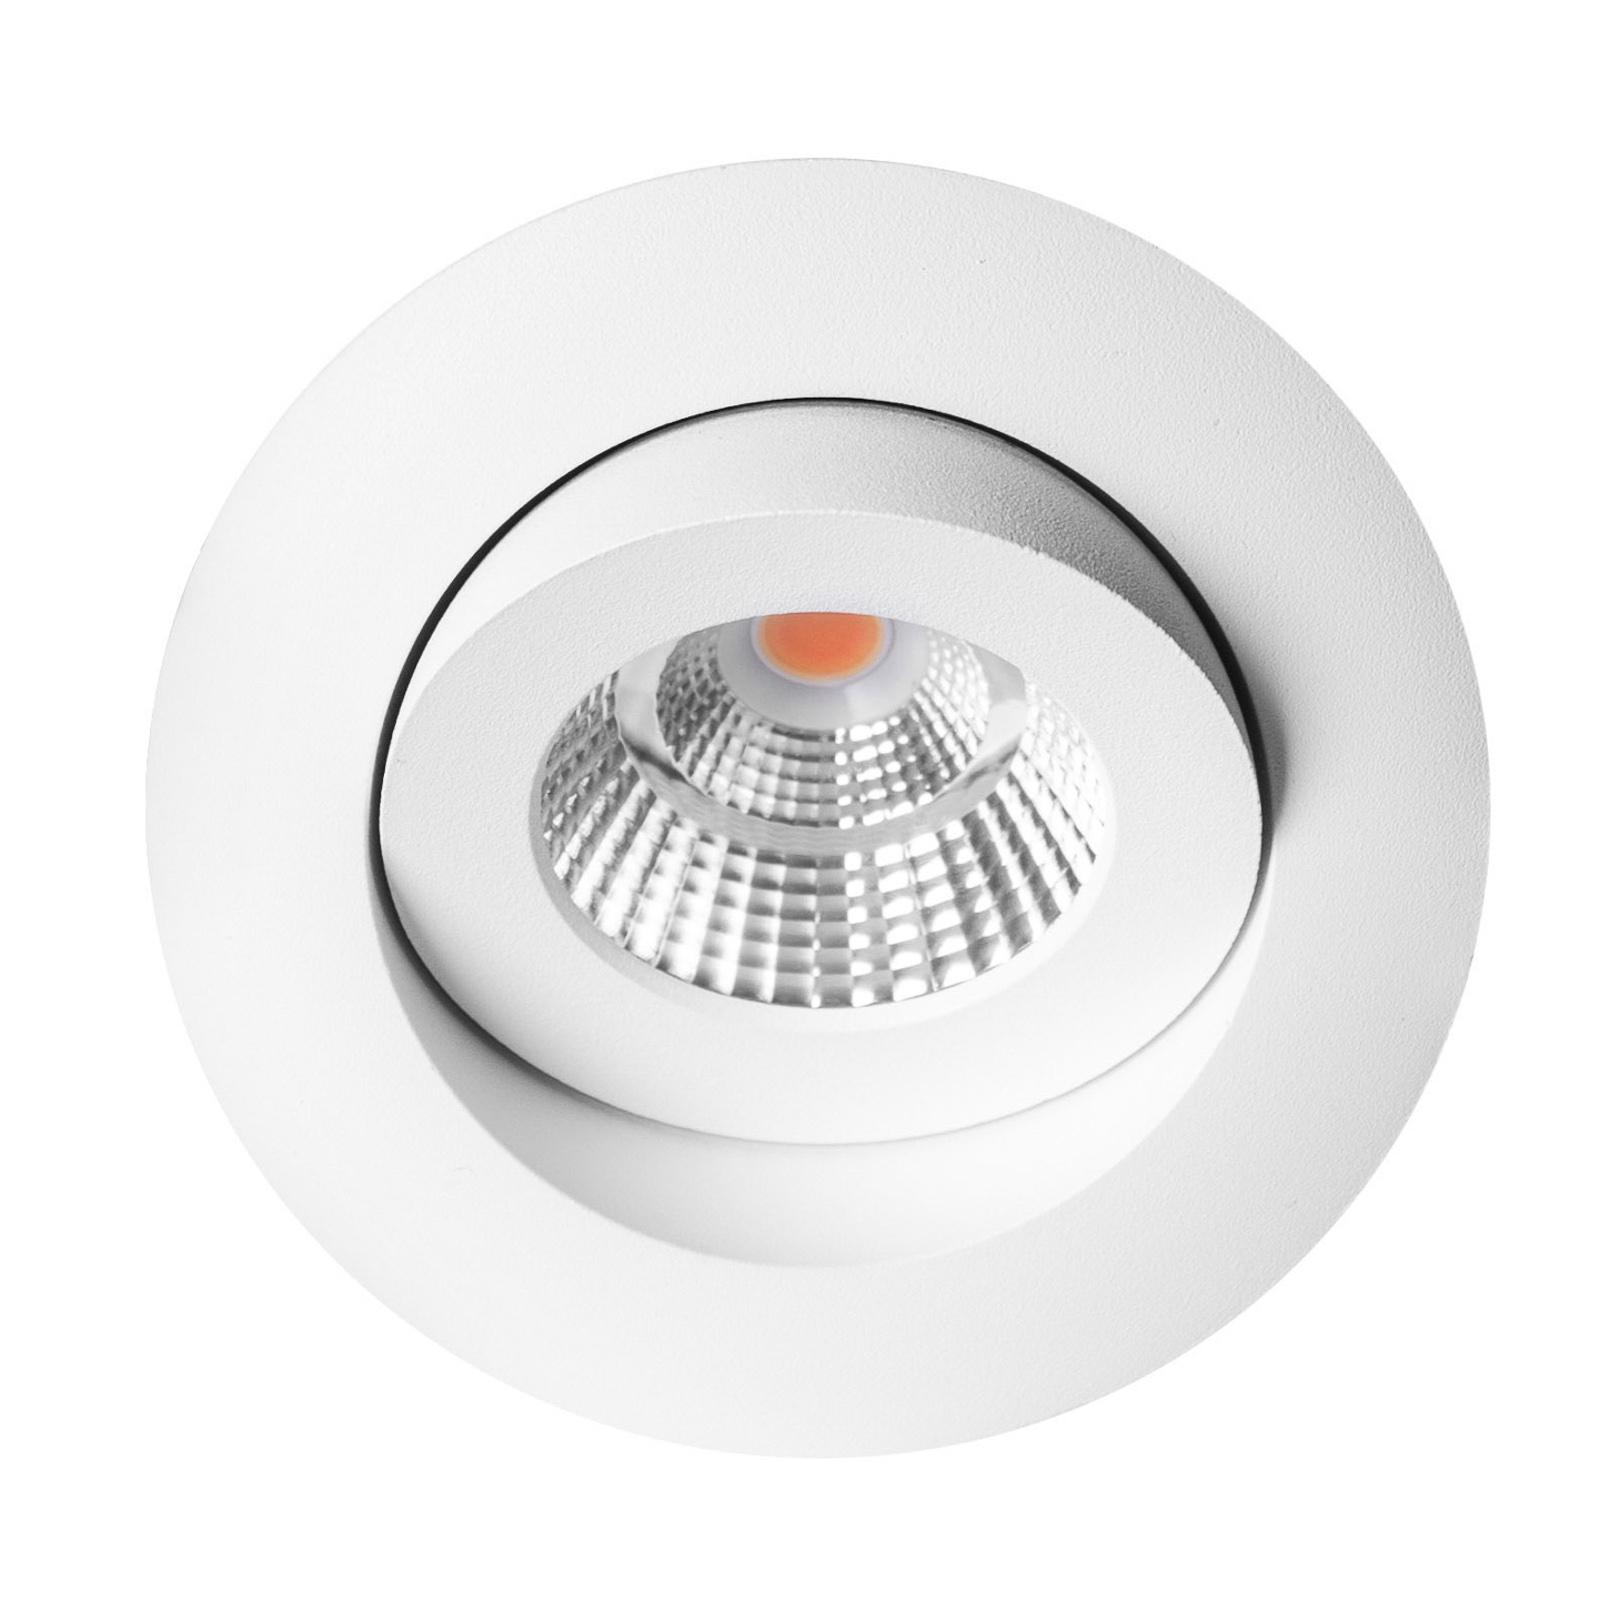 SLC One 360° LED-Einbauleuchte dim-to-warm weiß